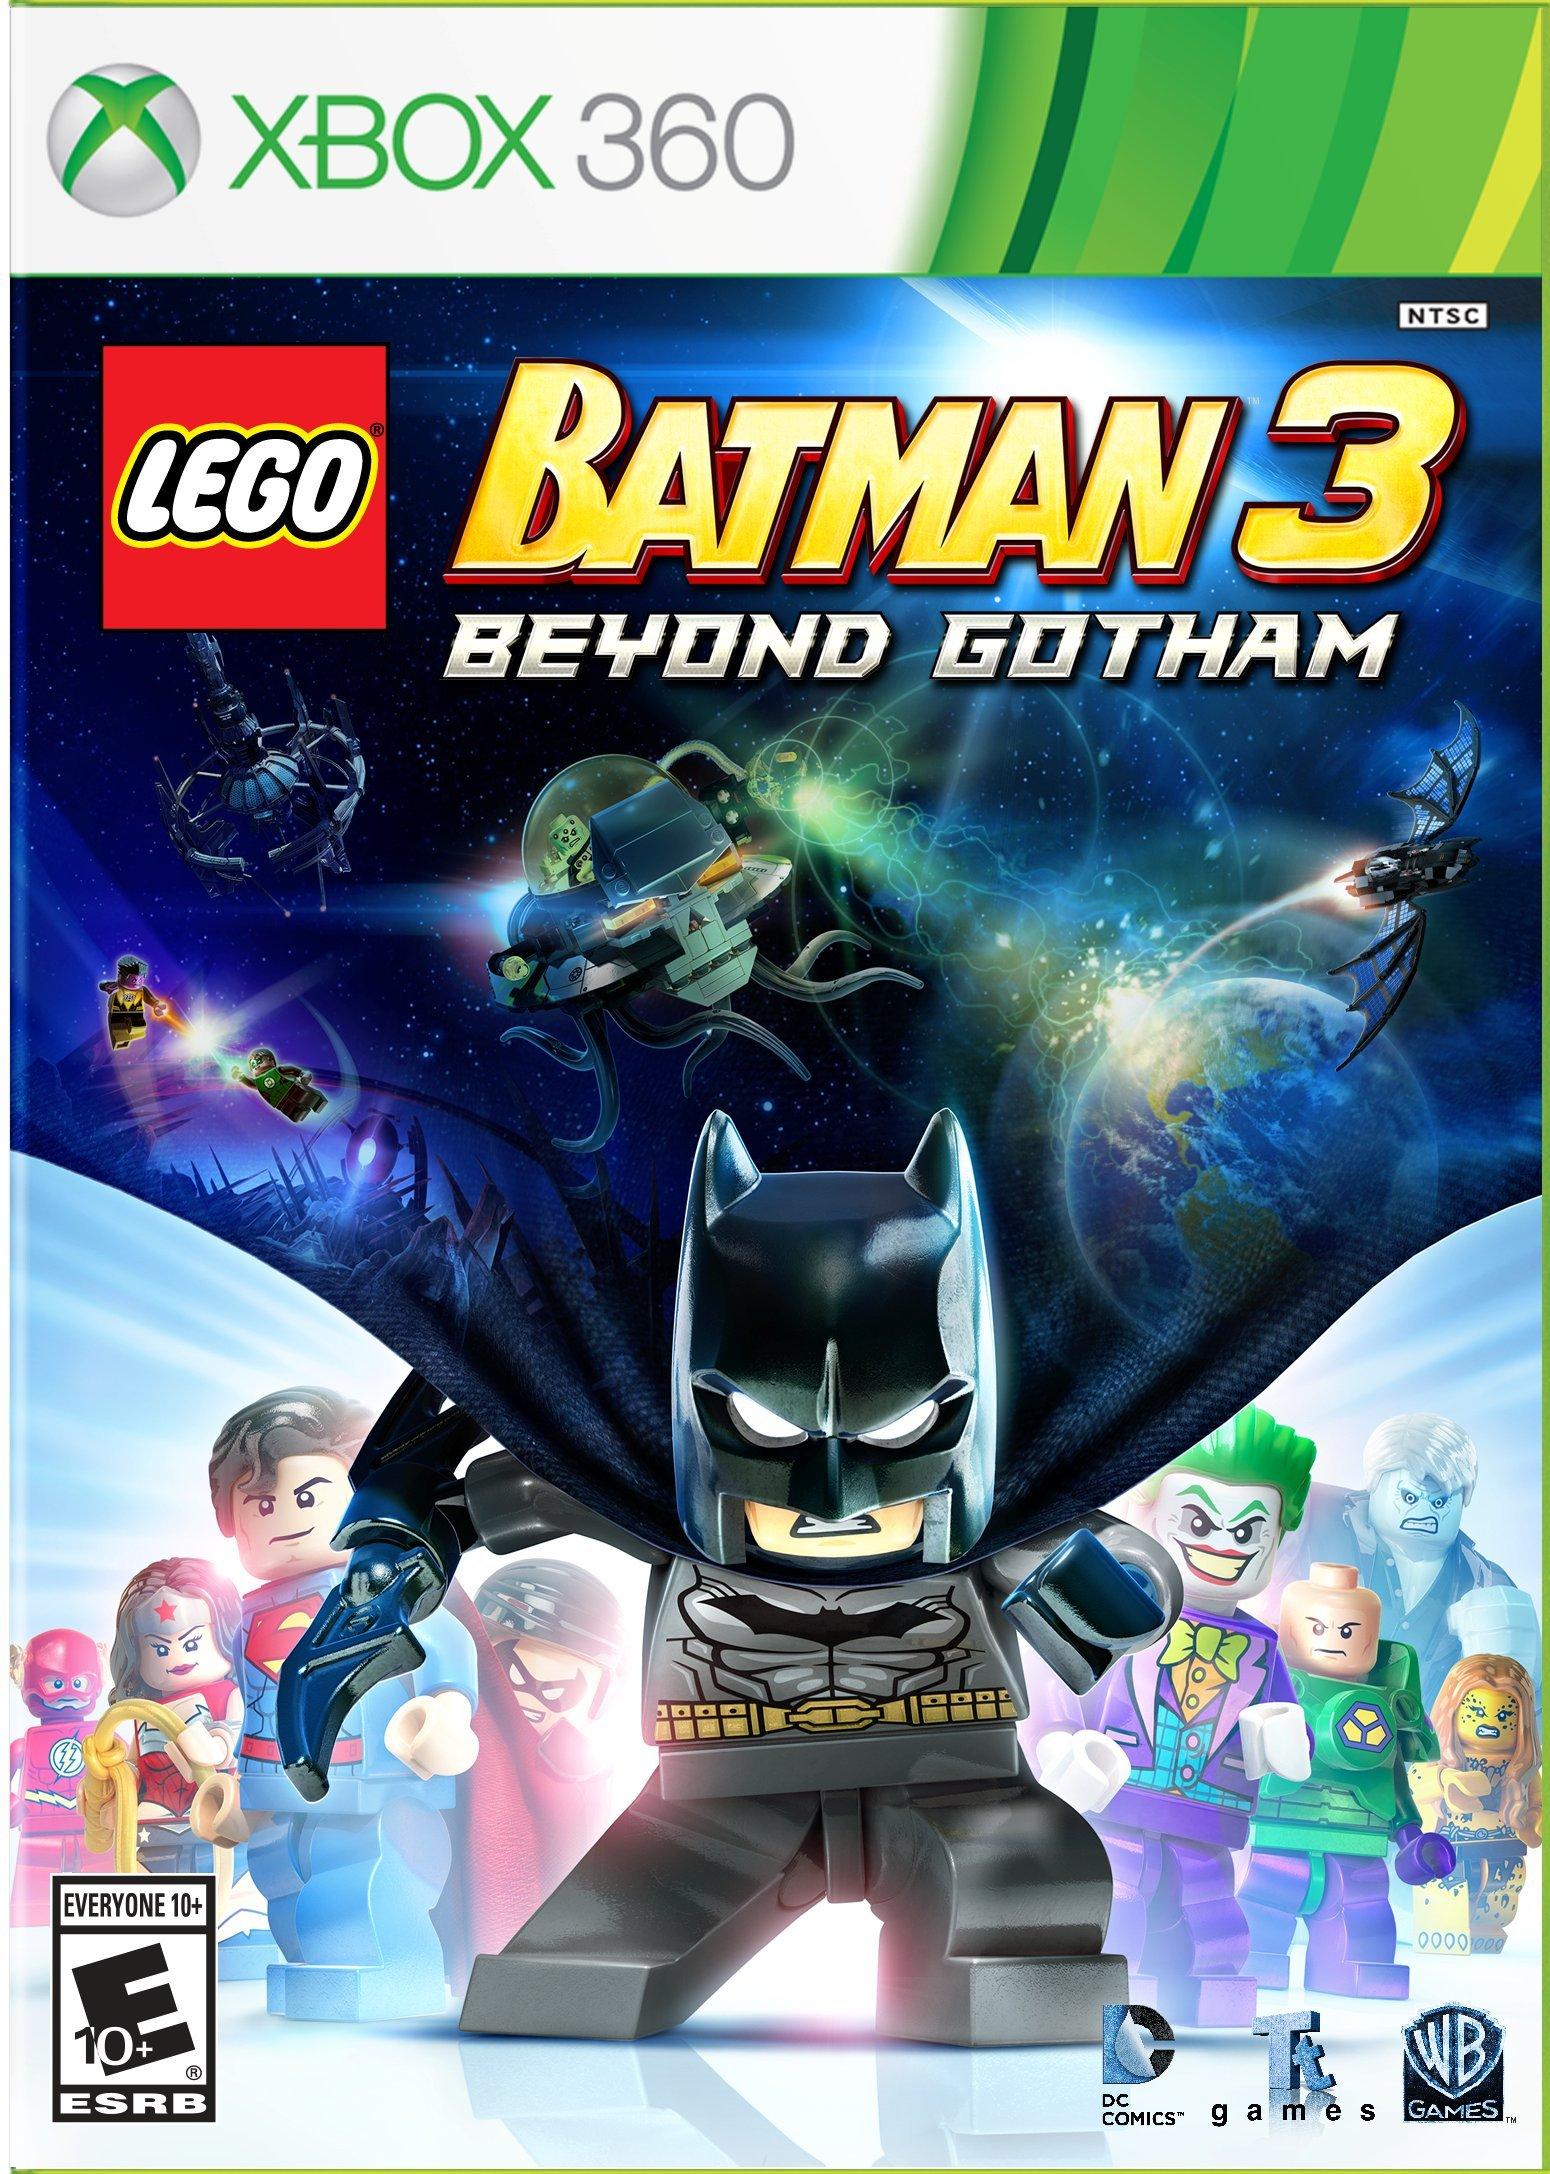 LEGO Batman 3: Beyond Gotham Release Date (Xbox 360, PS3, 3DS, Vita ...